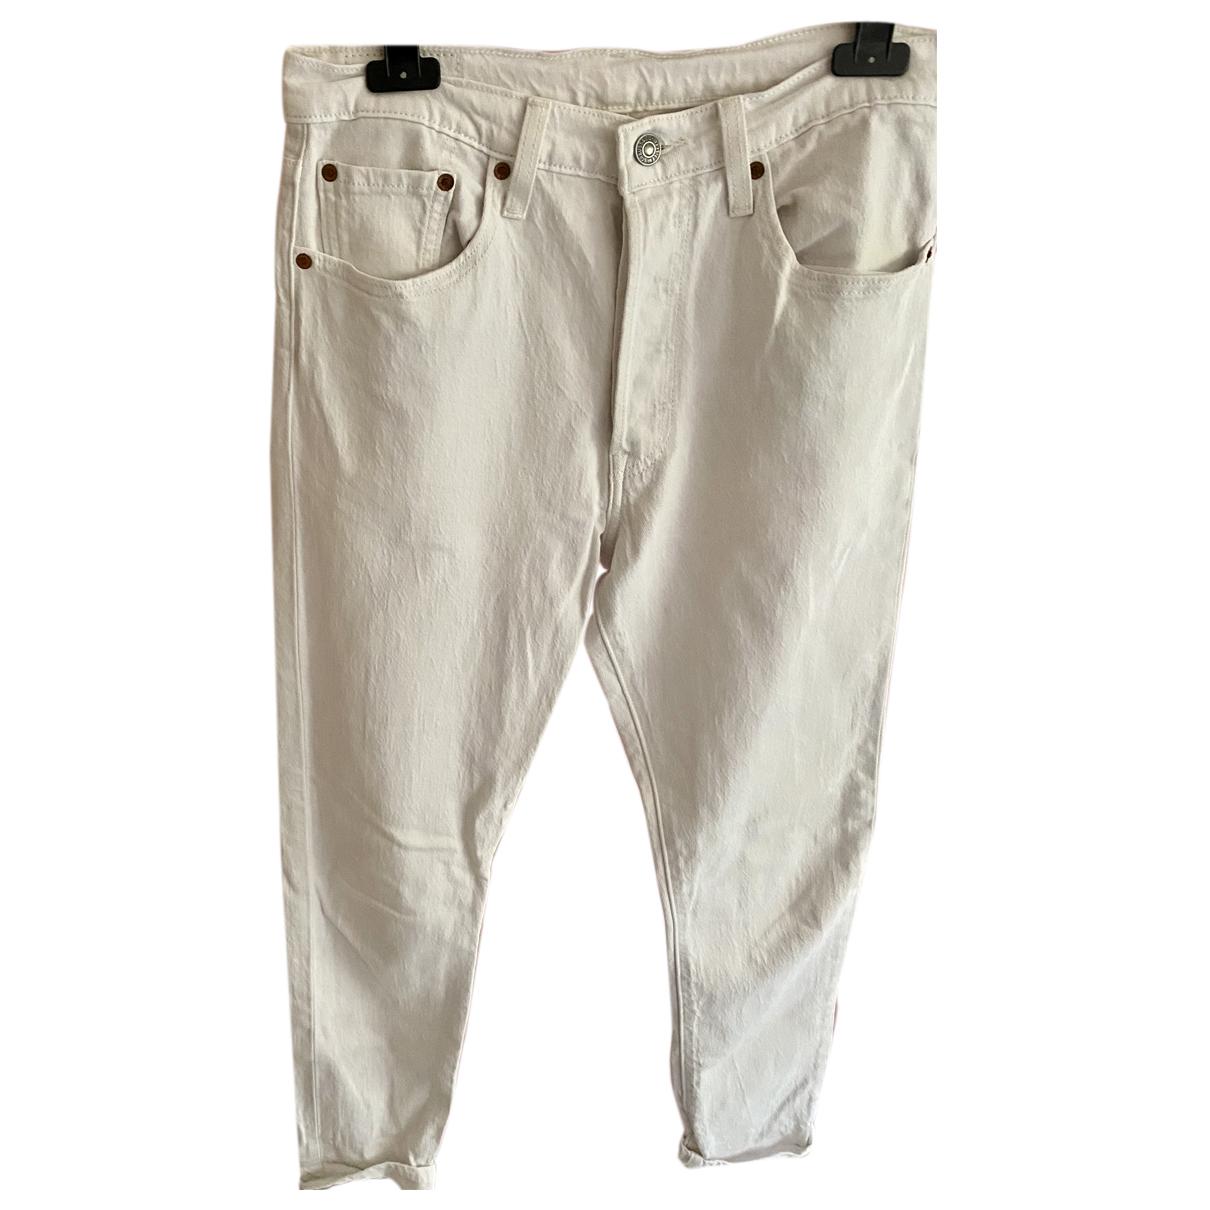 Levi's 501 White Cotton Jeans for Women 38 FR